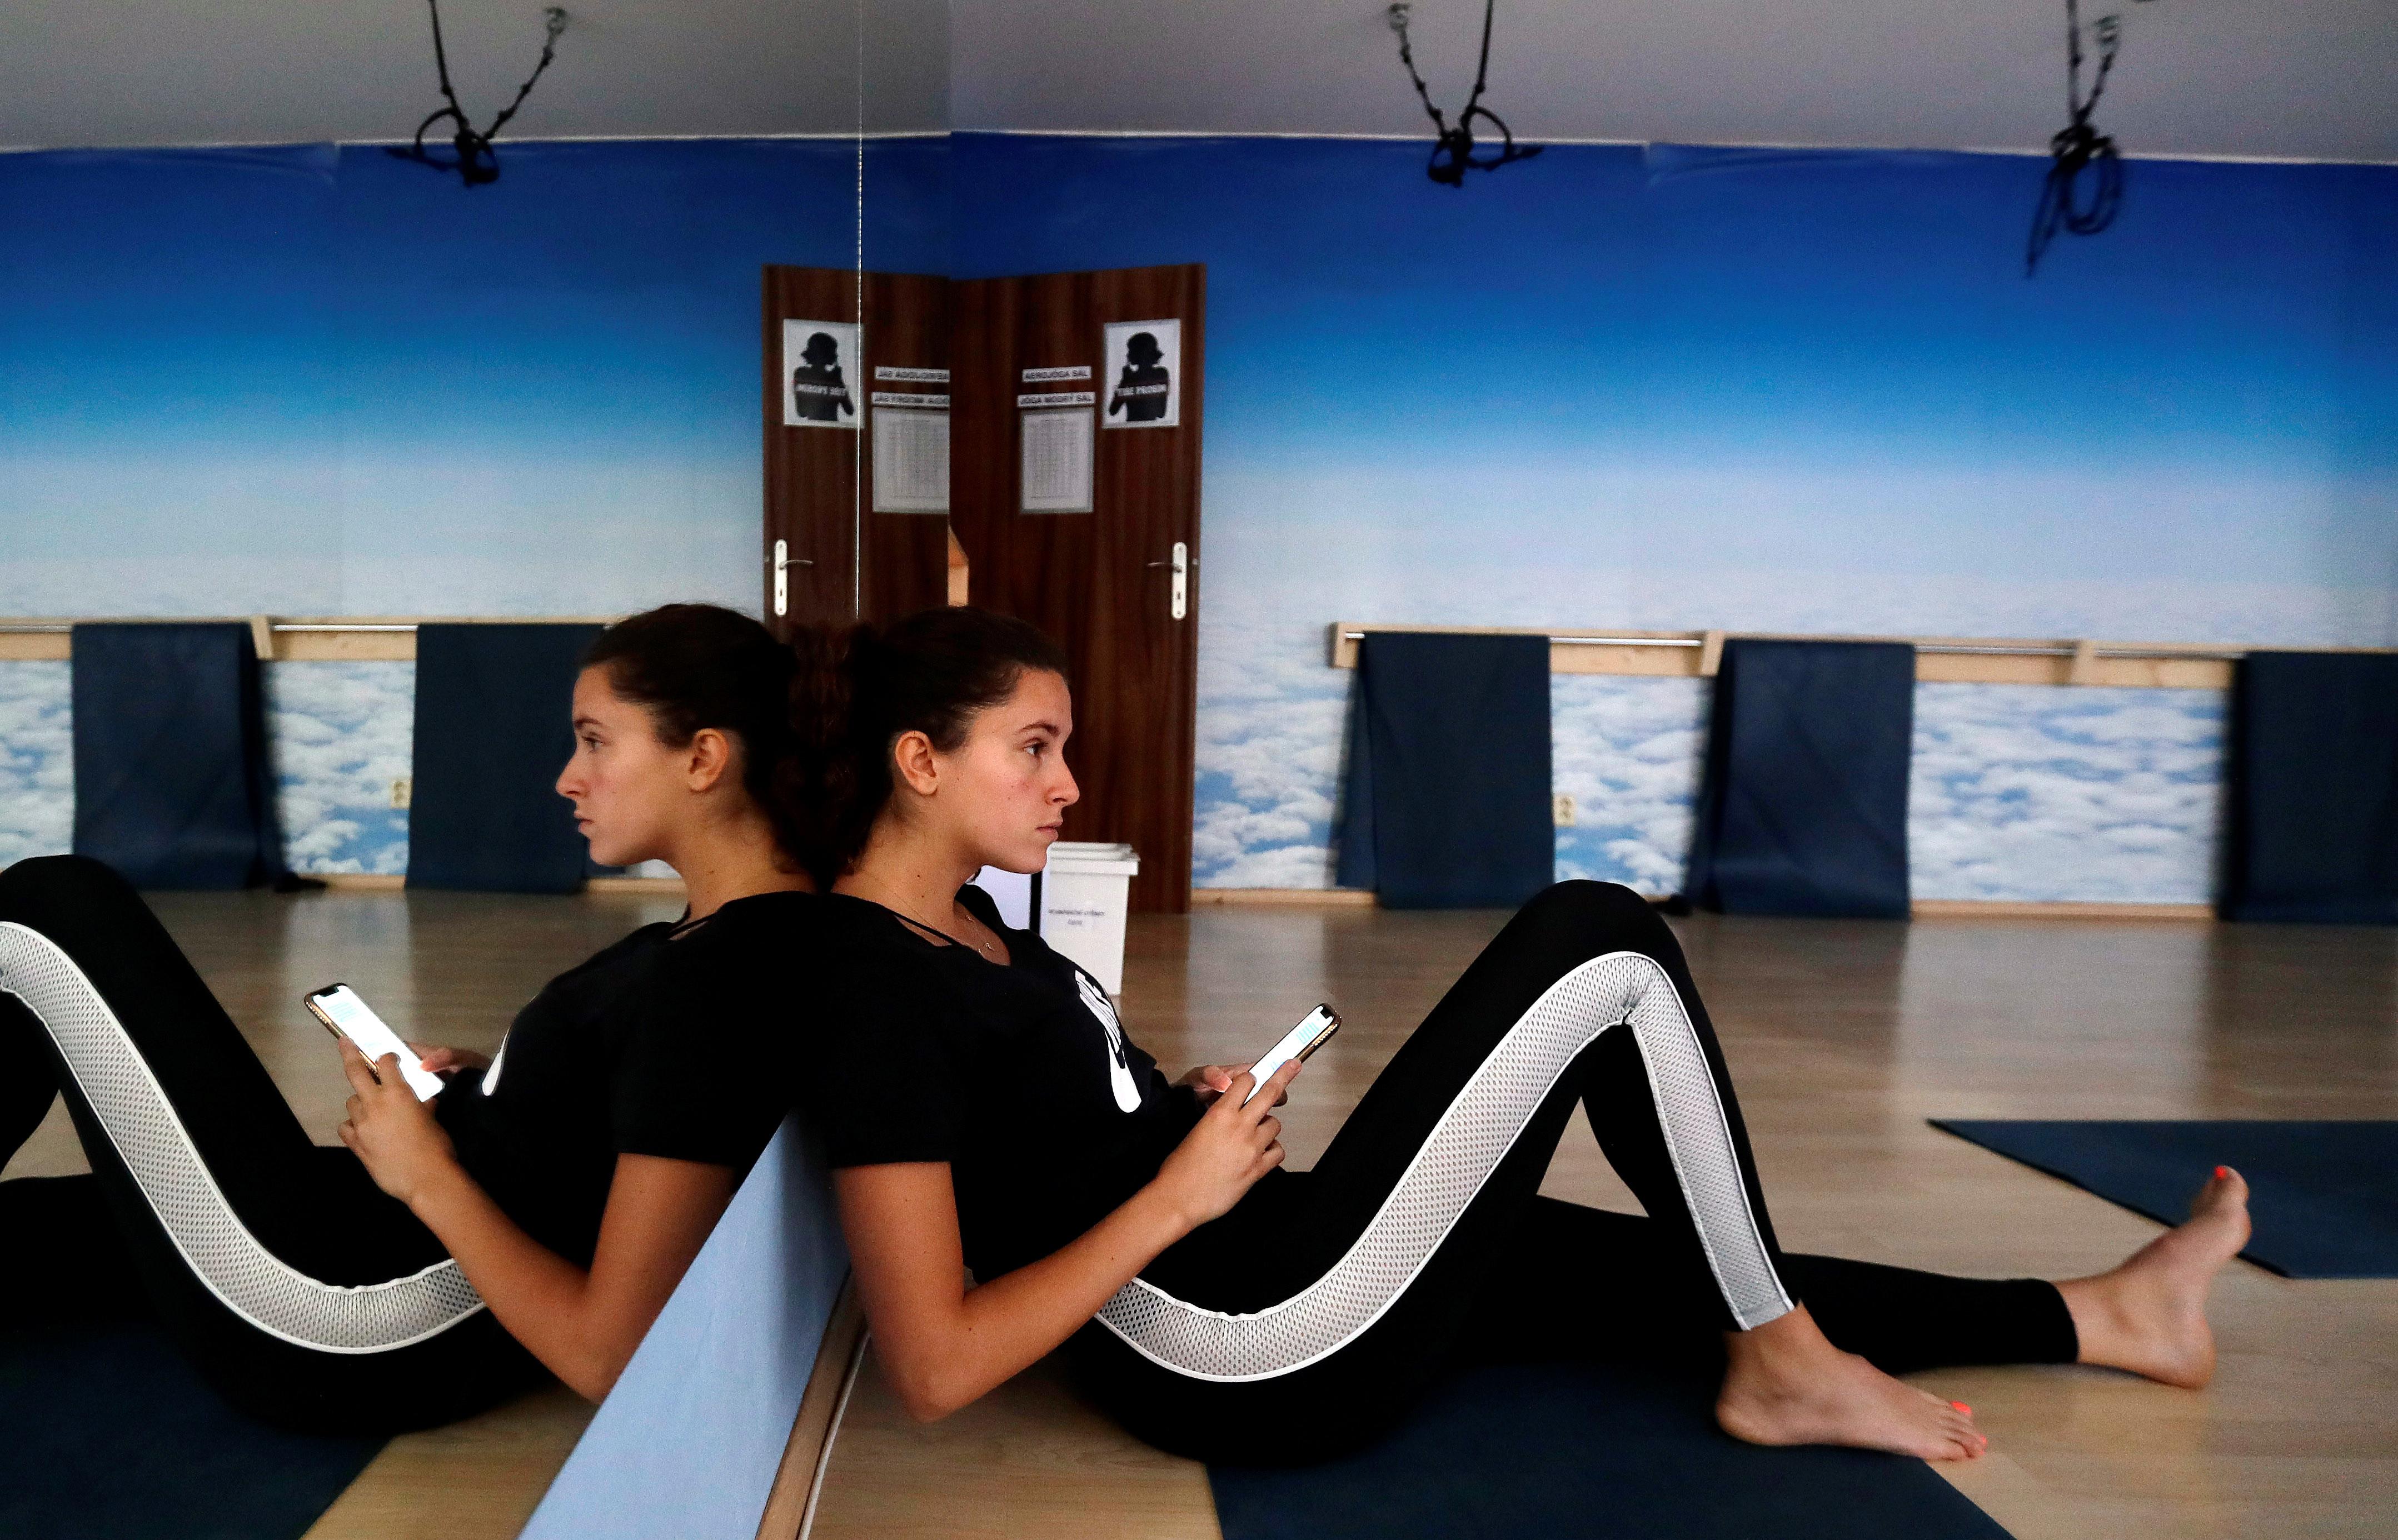 Dunia Skaunicova, a 24 years old job seeker, checks her mobile phone as she waits for a yoga class following the coronavirus disease (COVID-19) outbreak, in Prague, Czech Republic, July 8, 2020. Picture taken July 8, 2020. REUTERS/David W Cerny - RC2IPH9IB1BL